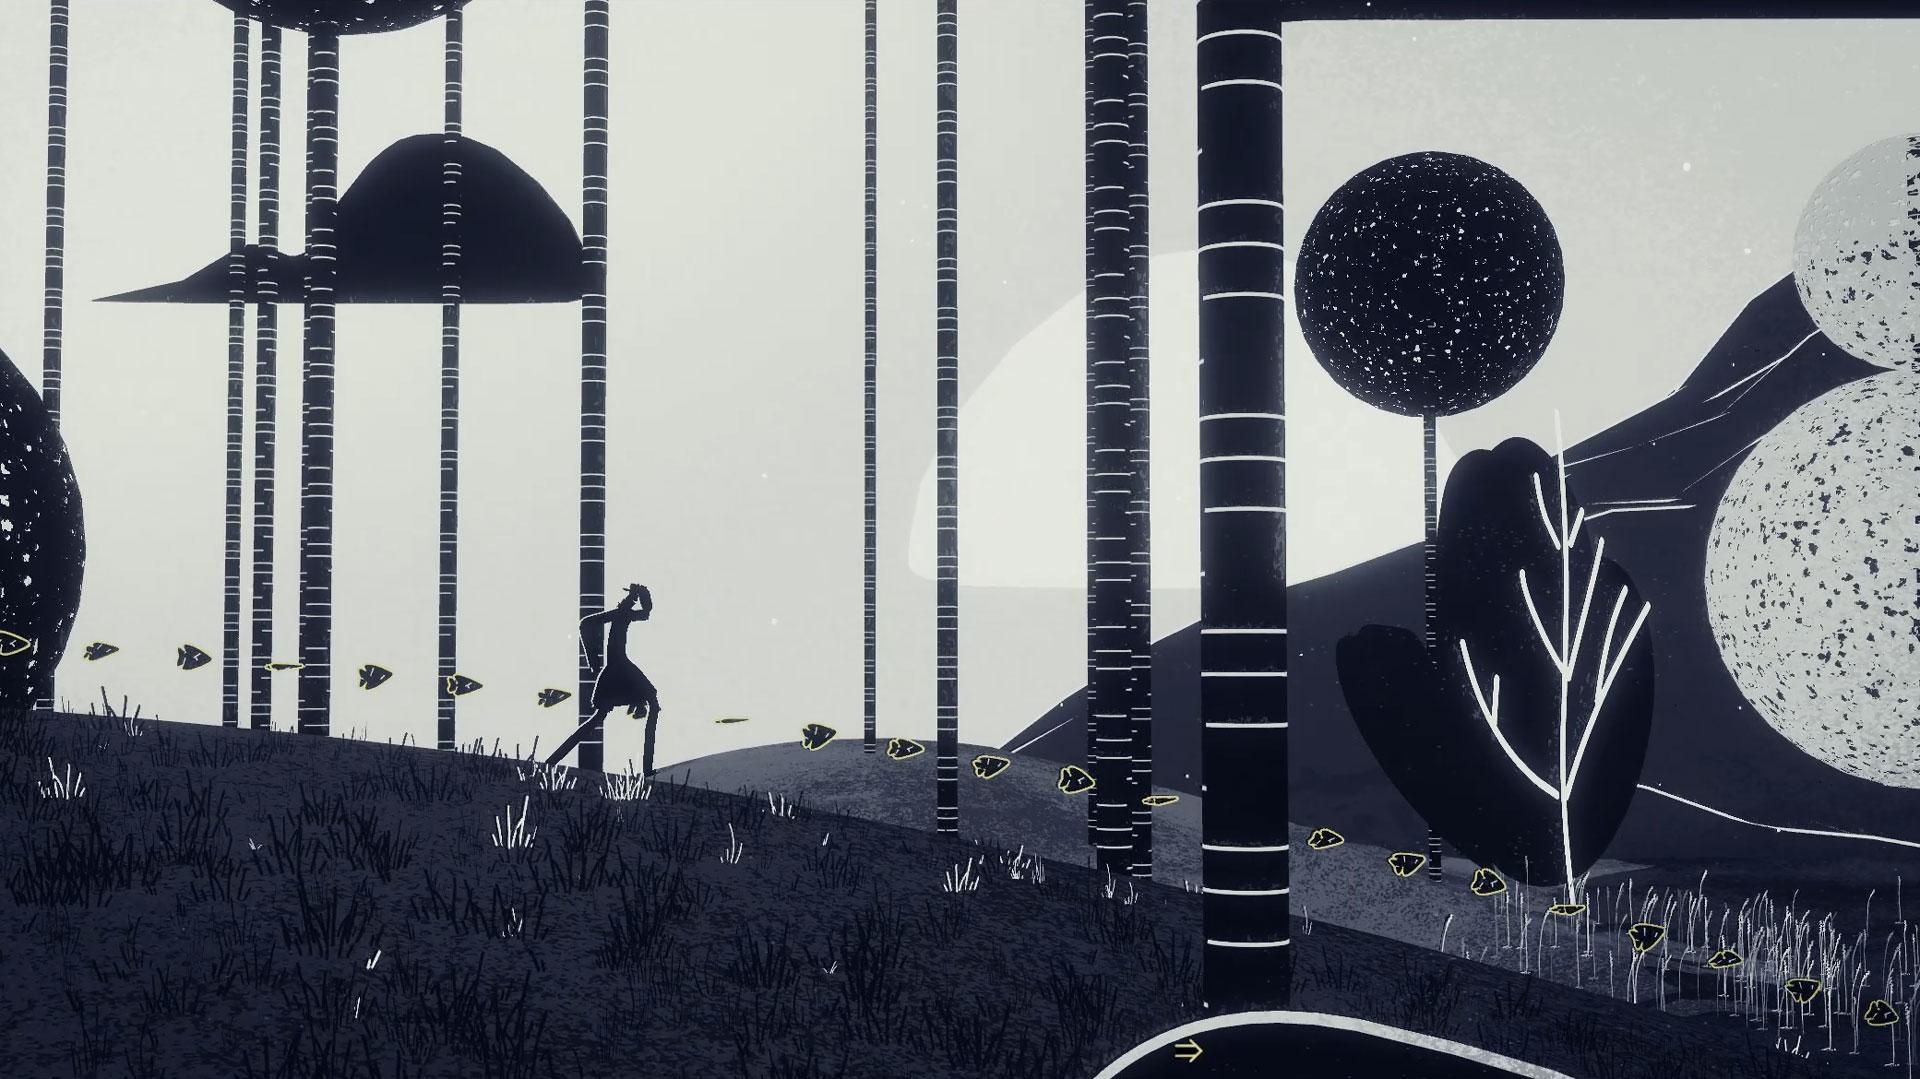 Genesis Noir No Man Walking through a forest